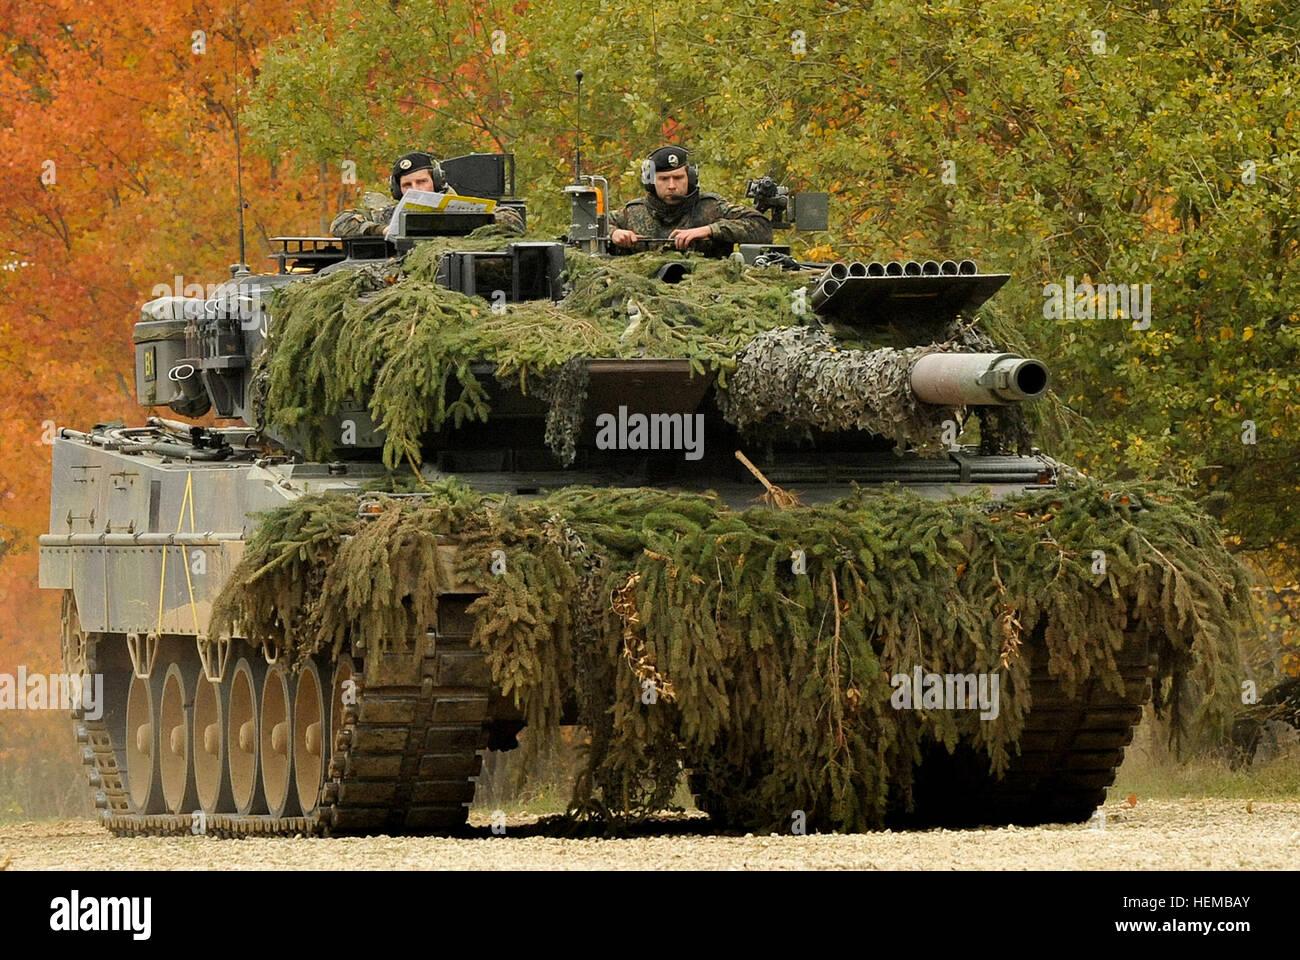 a-german-army-leopard-ii-tank-assigned-t